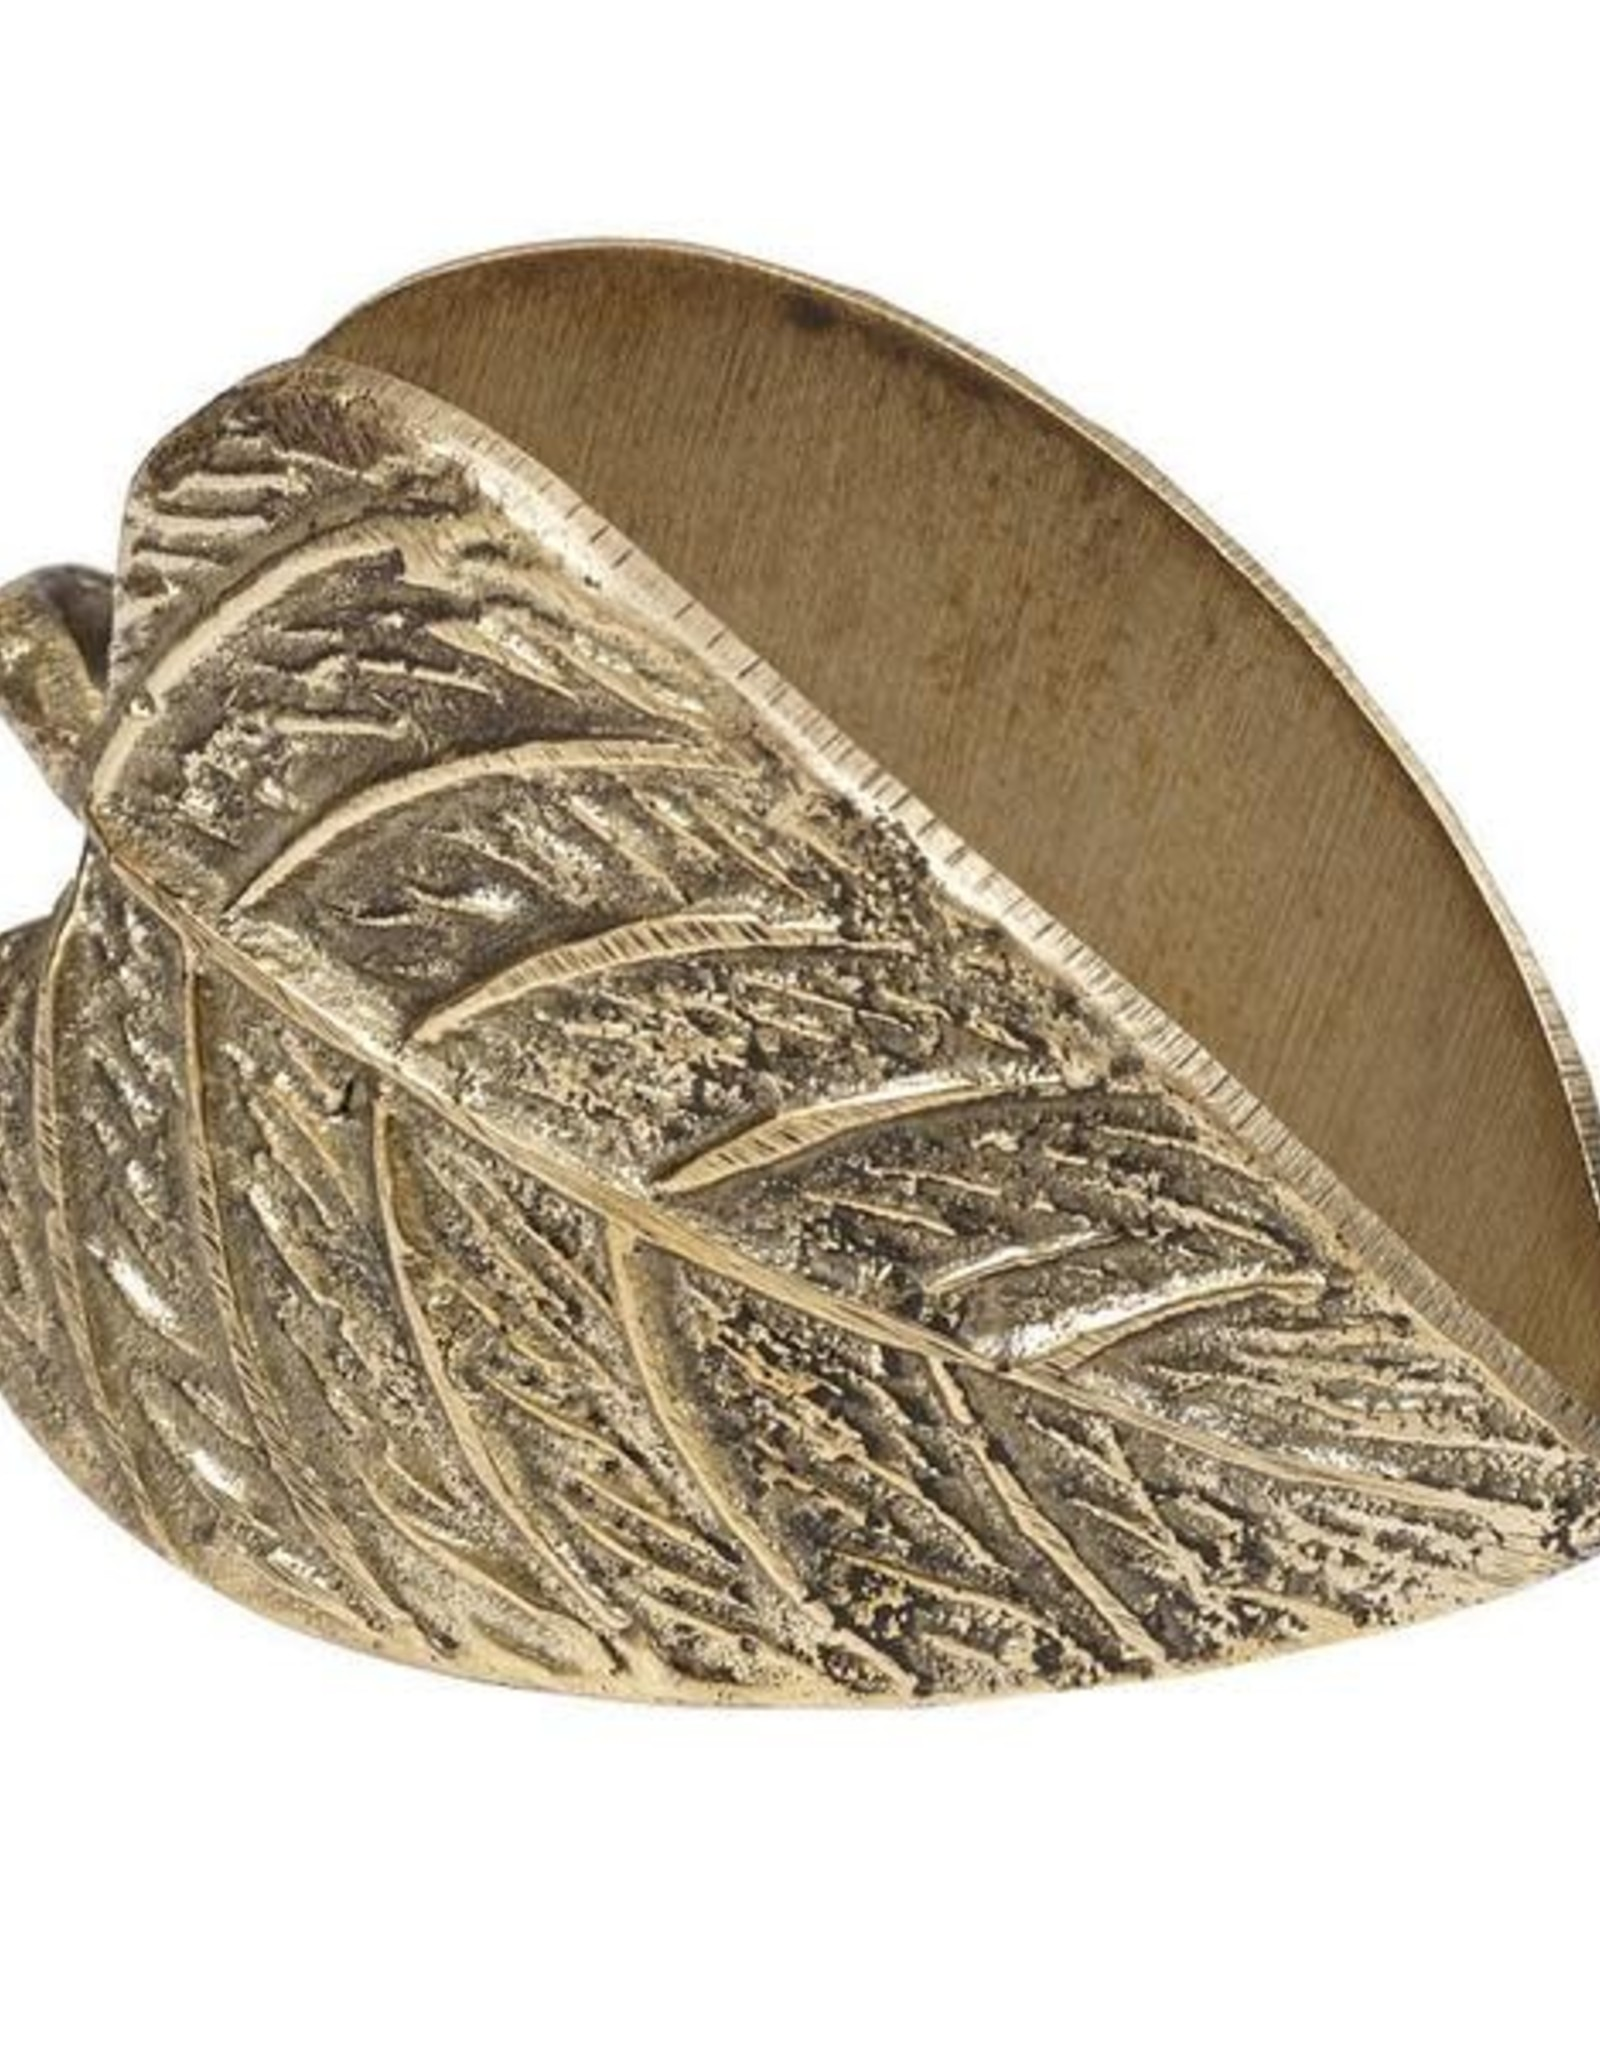 Design Imports Leaf Napkin Rings